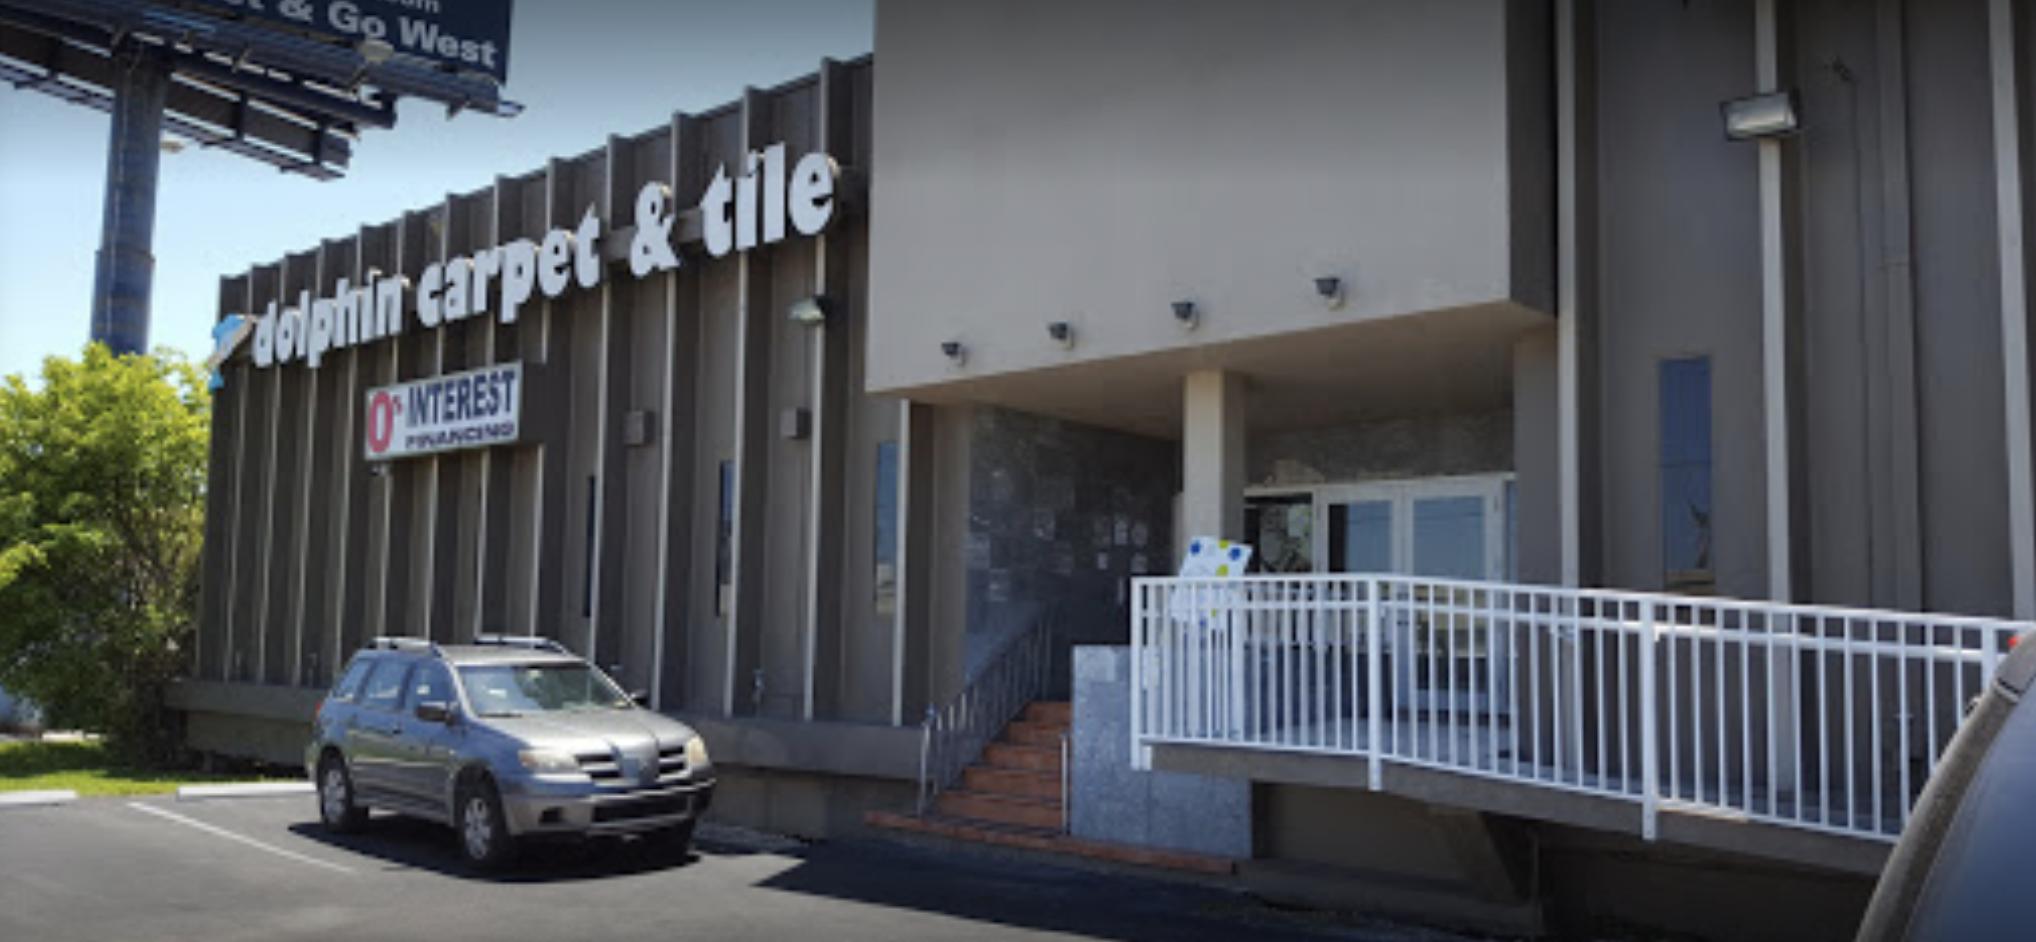 Dolphin Carpet & Tile store front